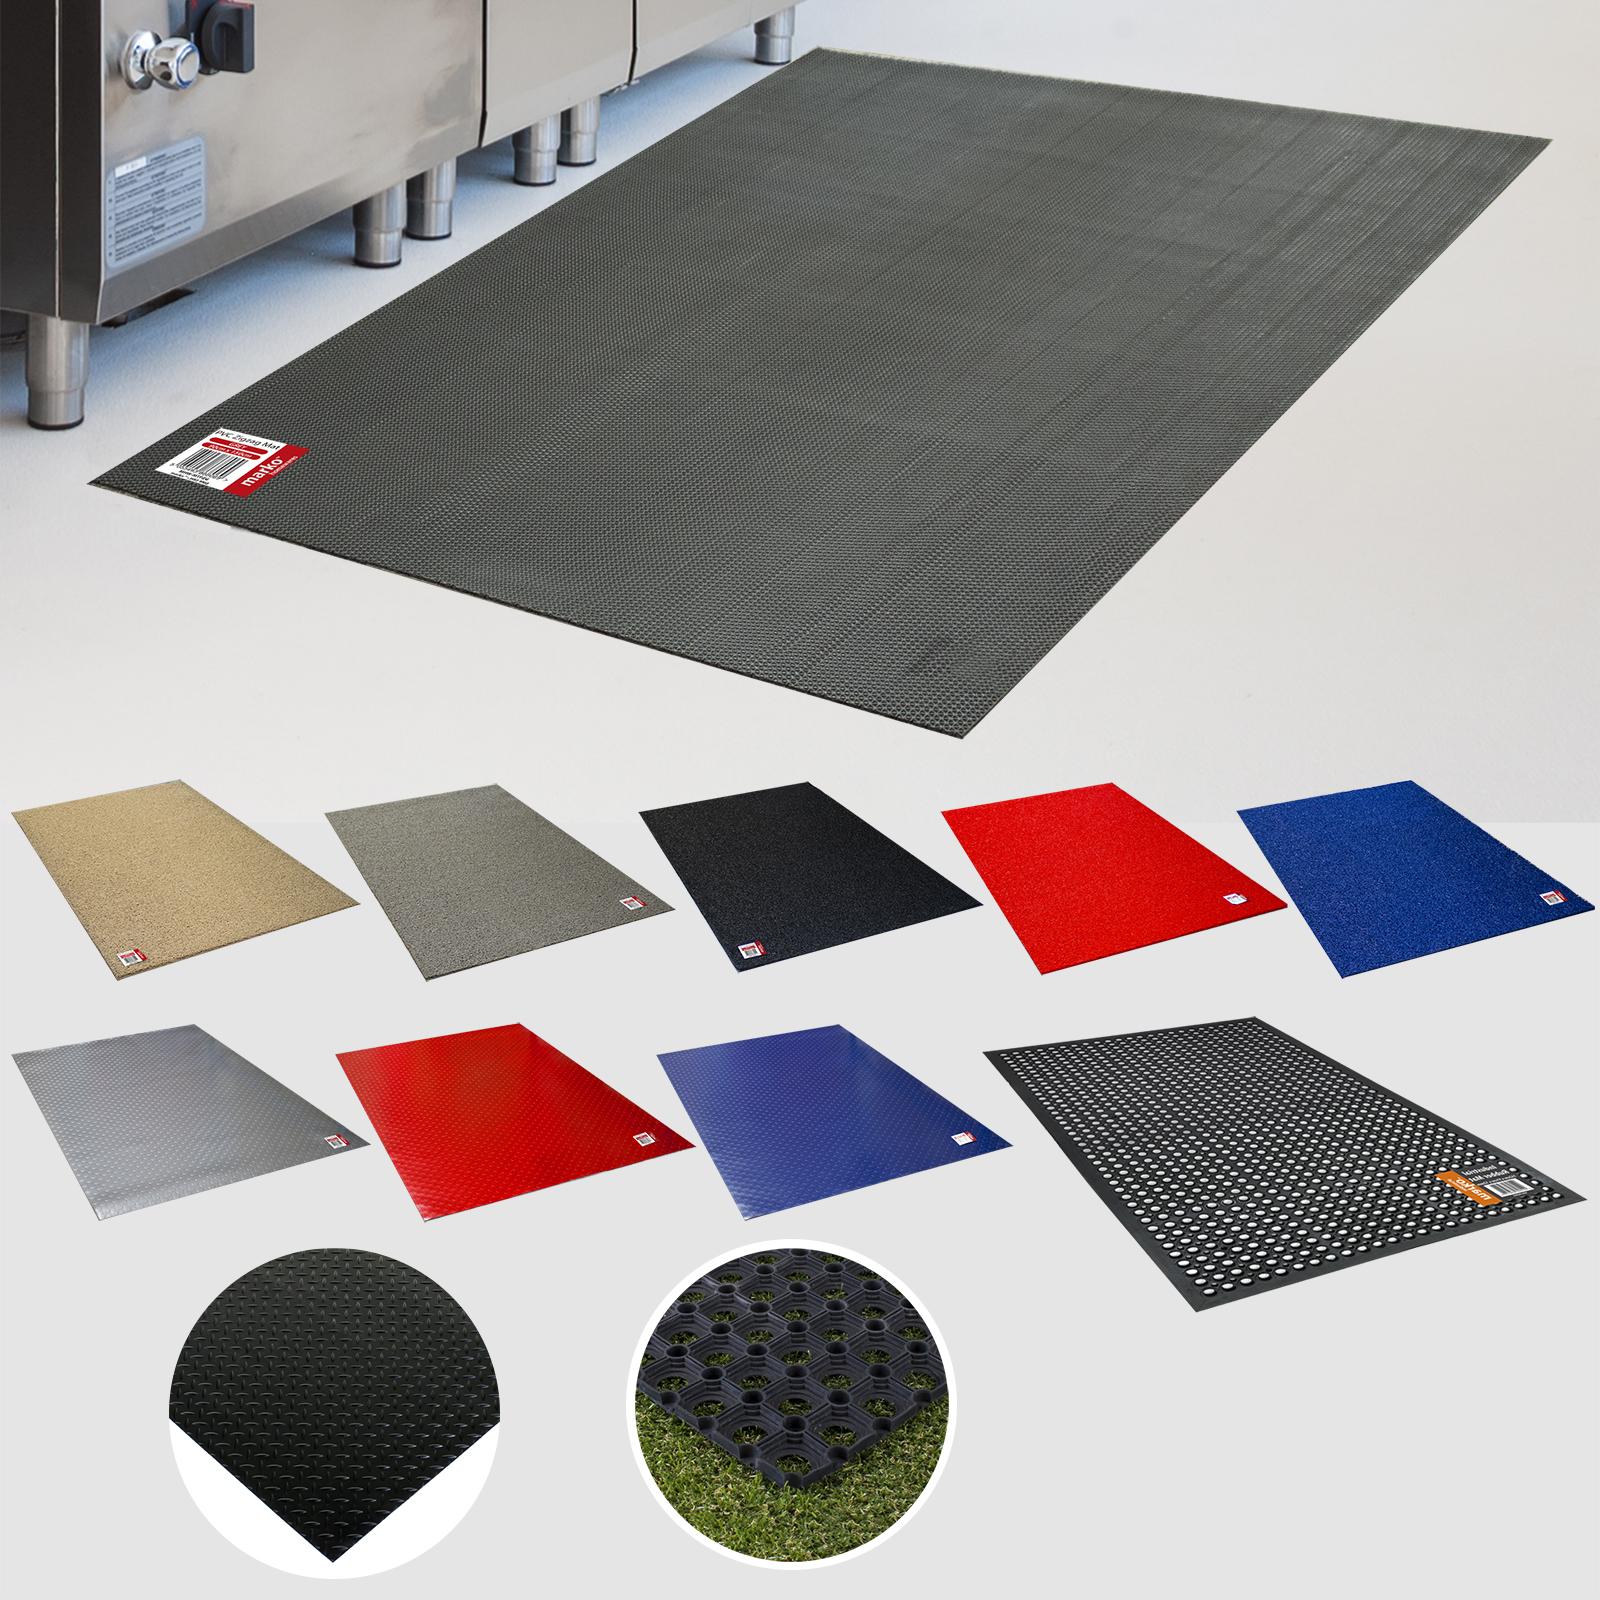 restaurant mat Interlocking Rubber Safety Mat Wet room flooring 3ftx3ft 90x90cm